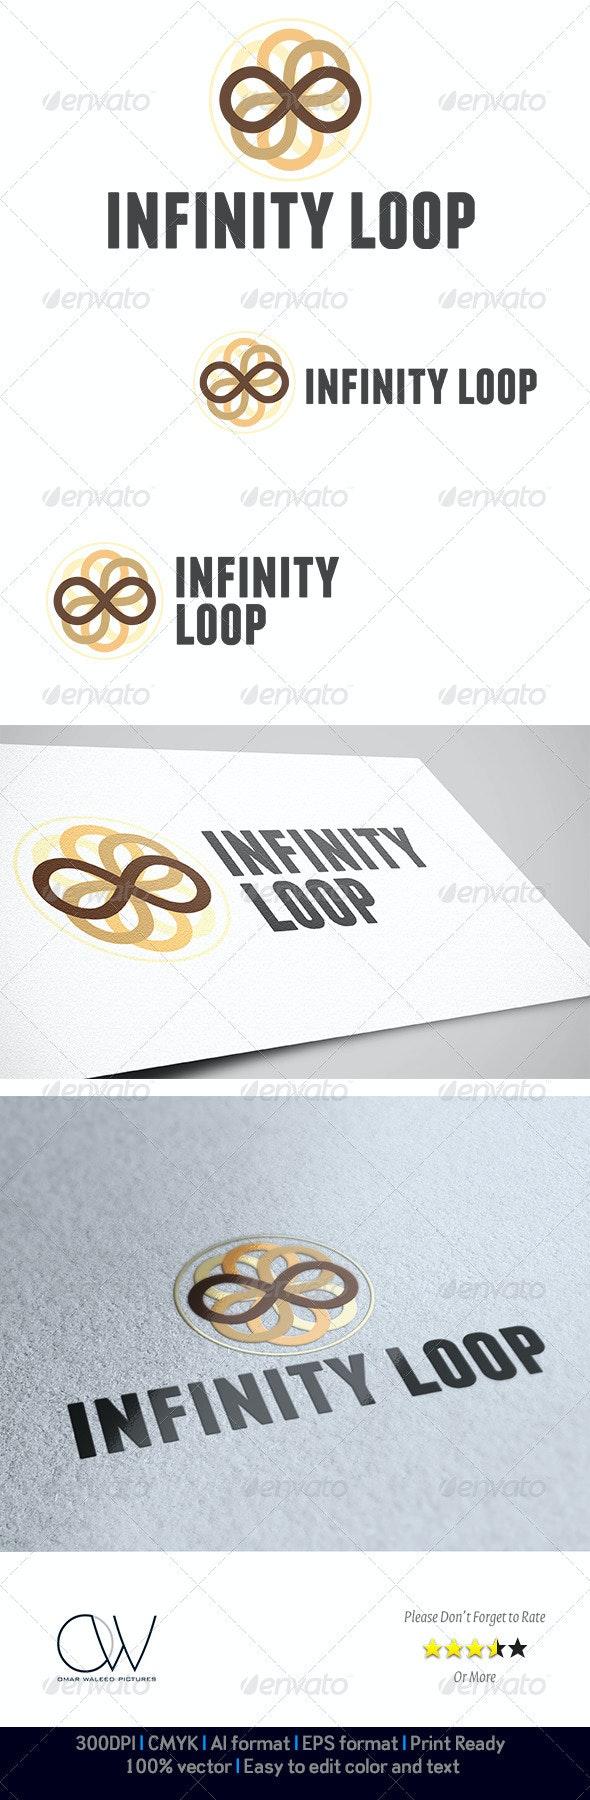 Infinity Loop Logo - Abstract Logo Templates